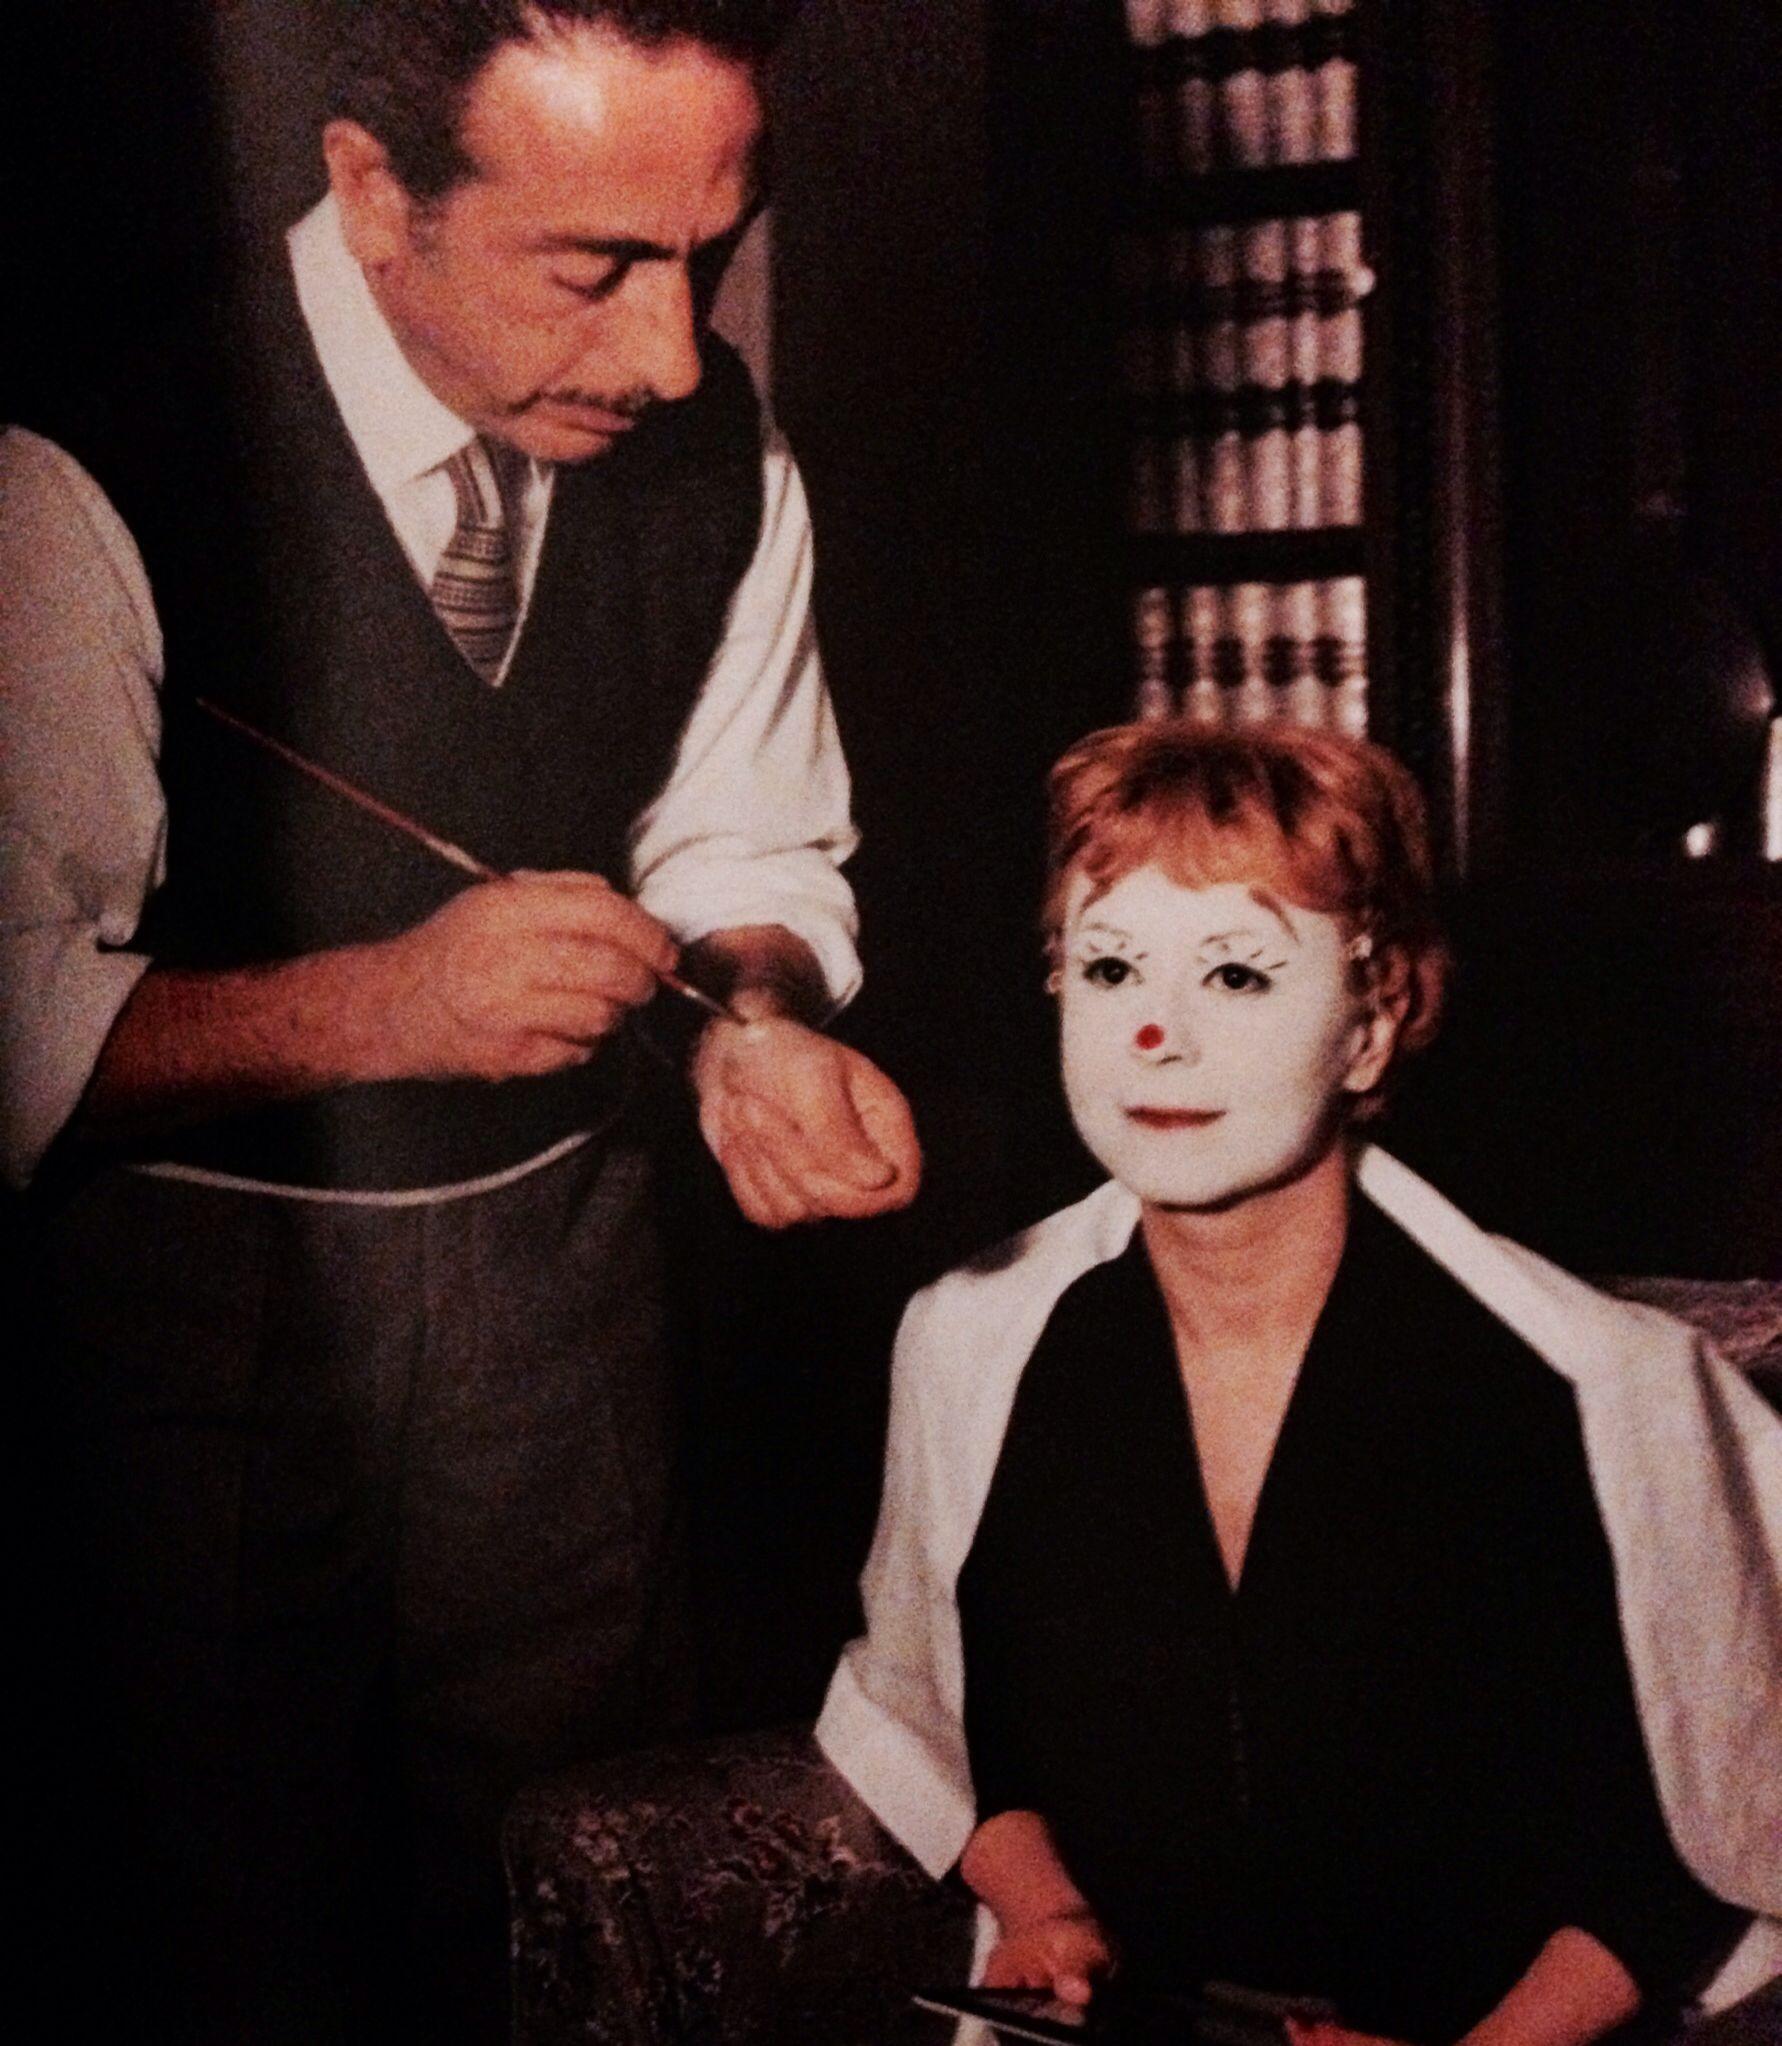 La Strada make up artist + actor, Fellini